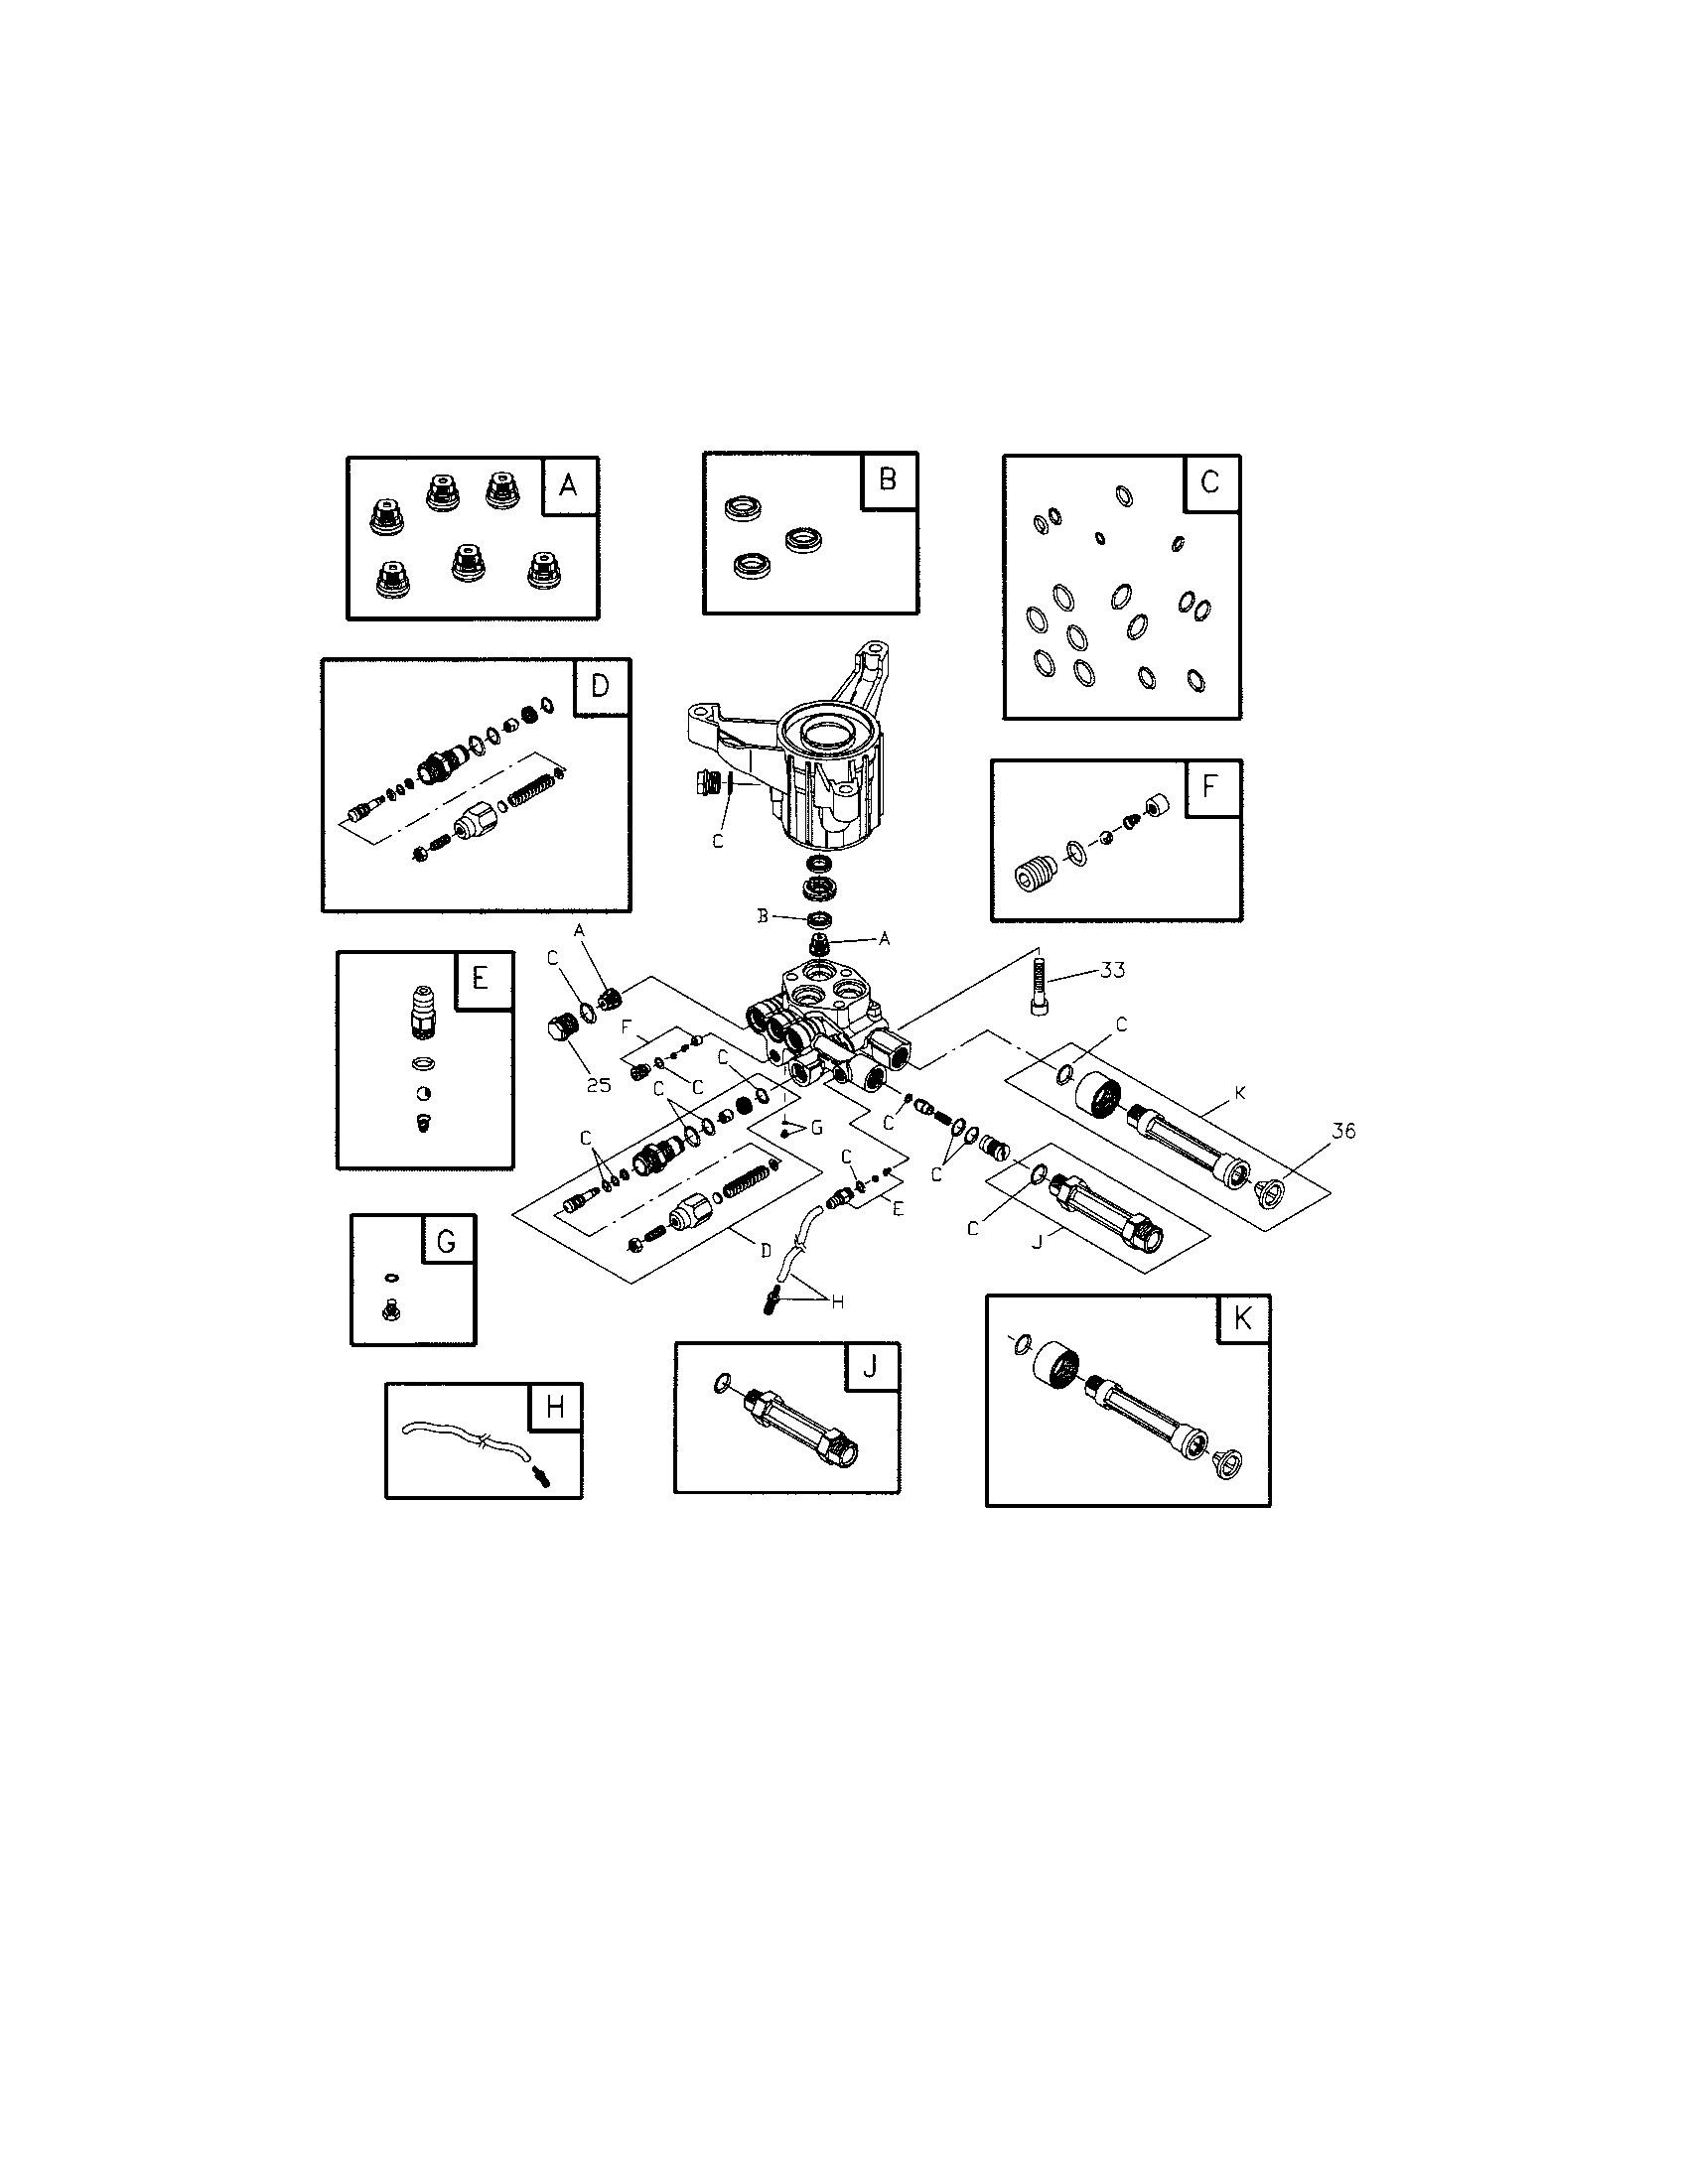 Briggs And Stratton Parts Diagram Engine 2 Model Troybilt Pressure Washer Of